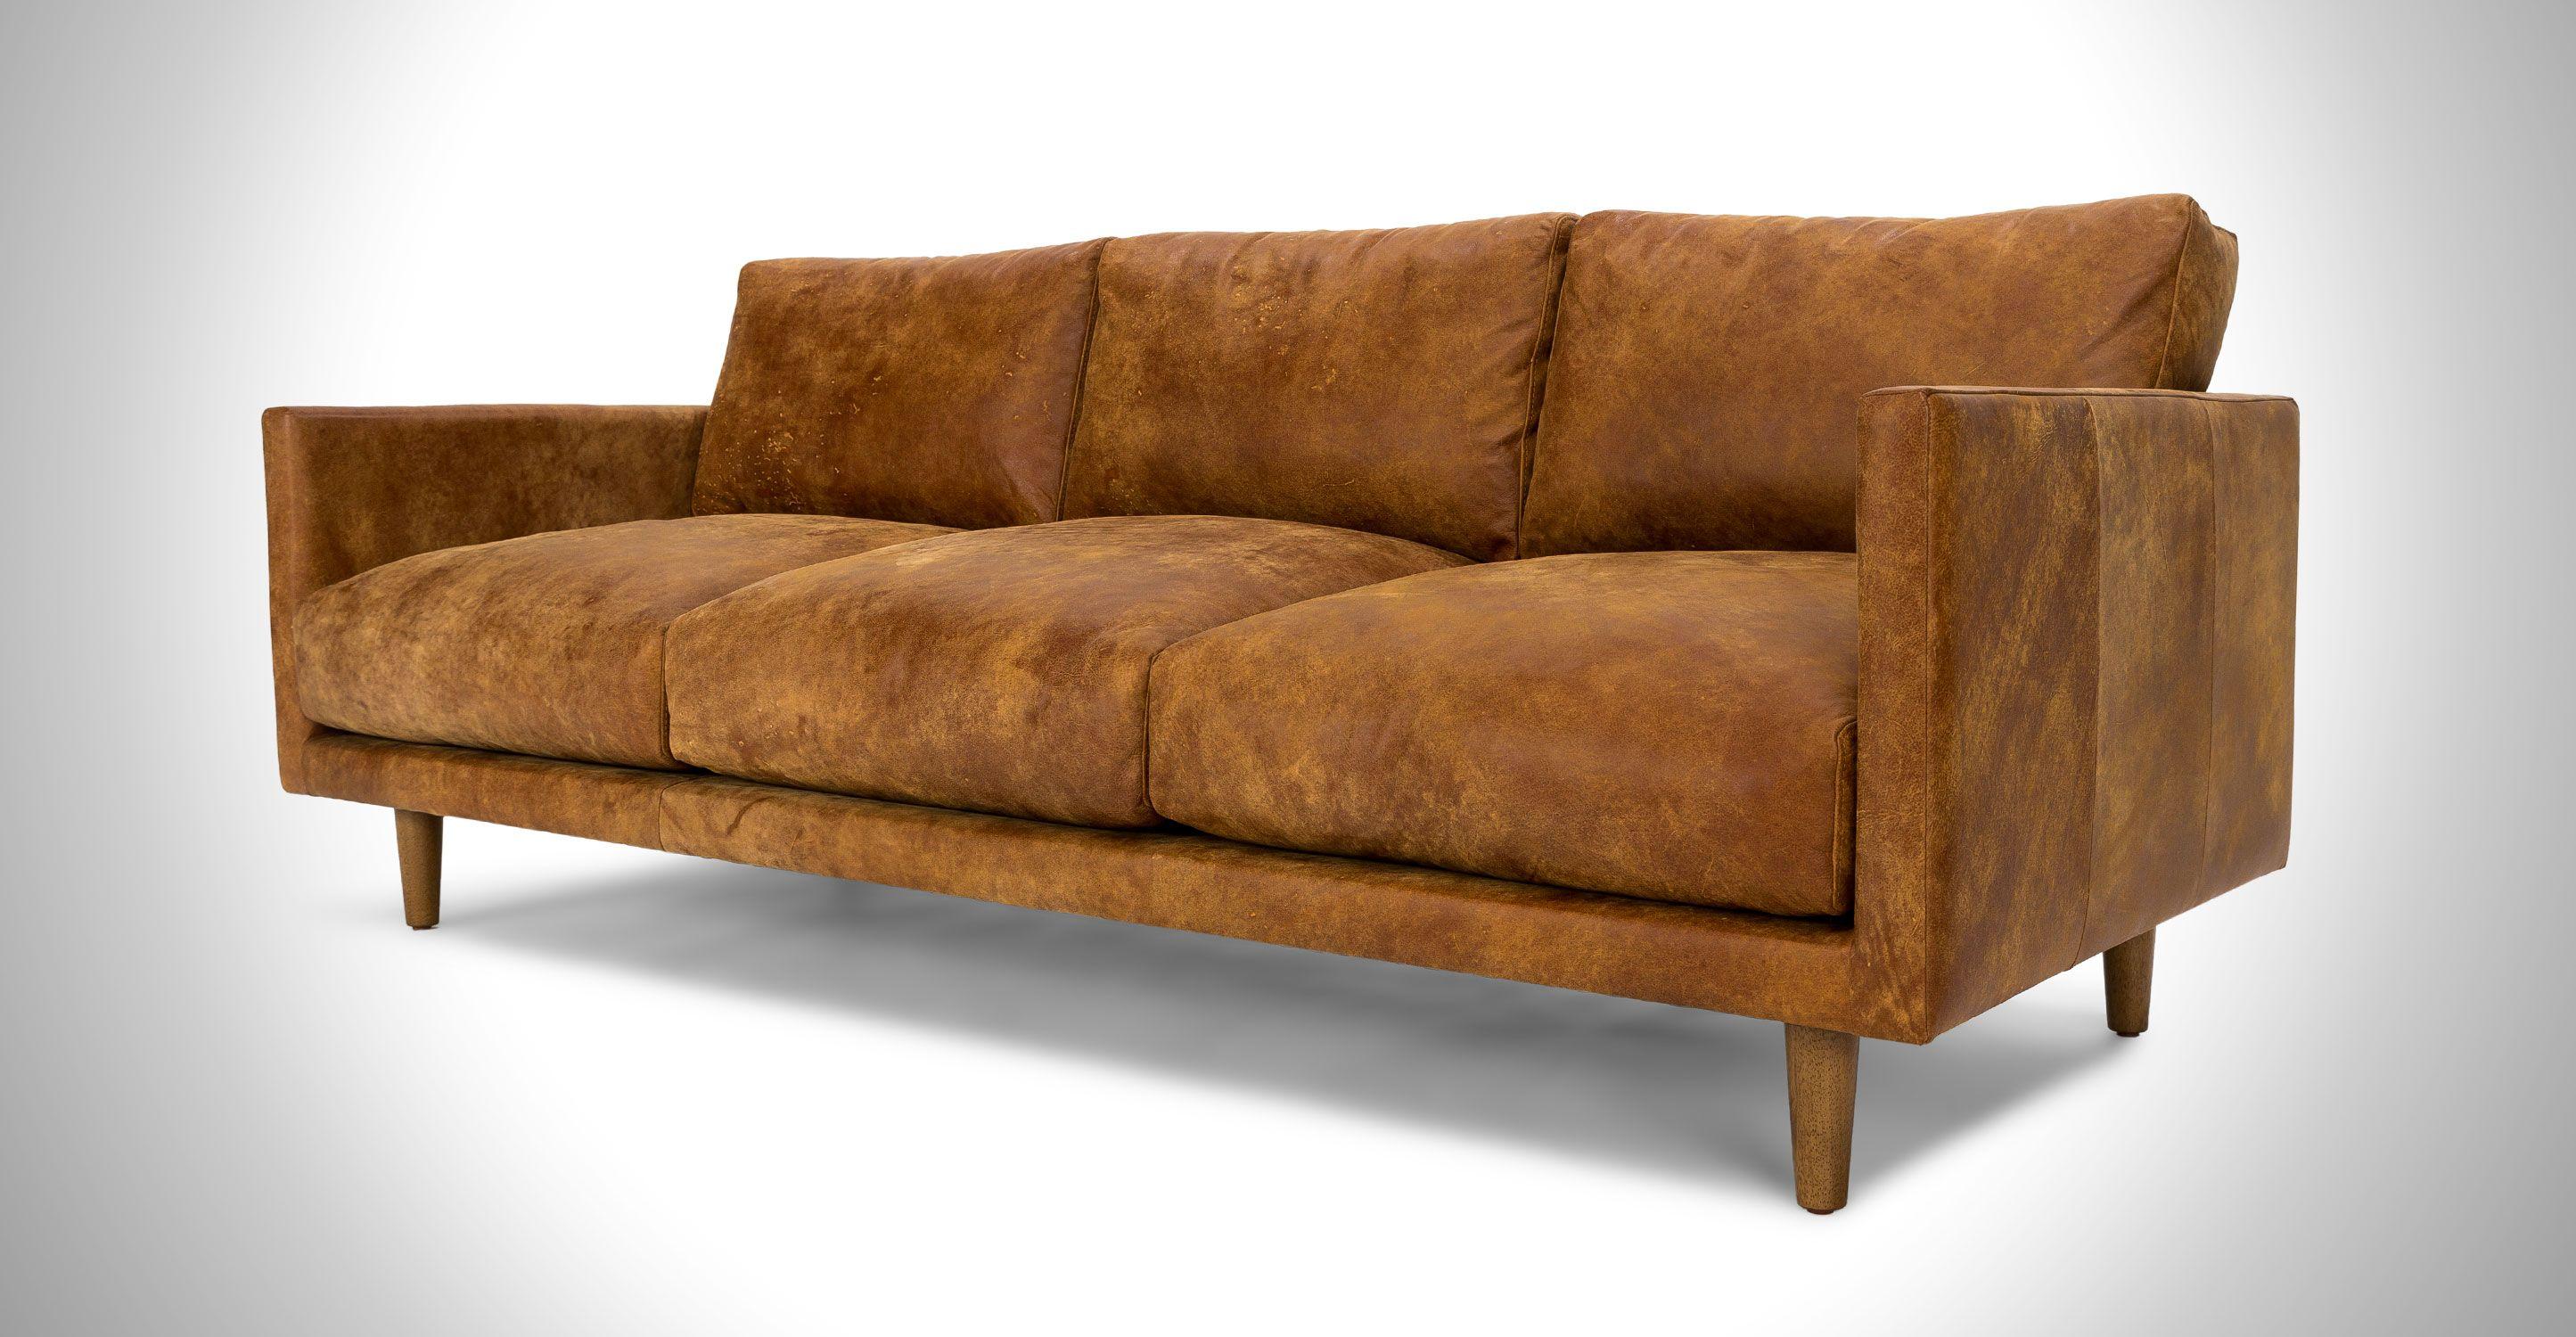 scandinavian leather furniture. Nirvana Dakota Tan Sofa - Sofas Article | Modern, Mid-Century And Scandinavian Leather Furniture